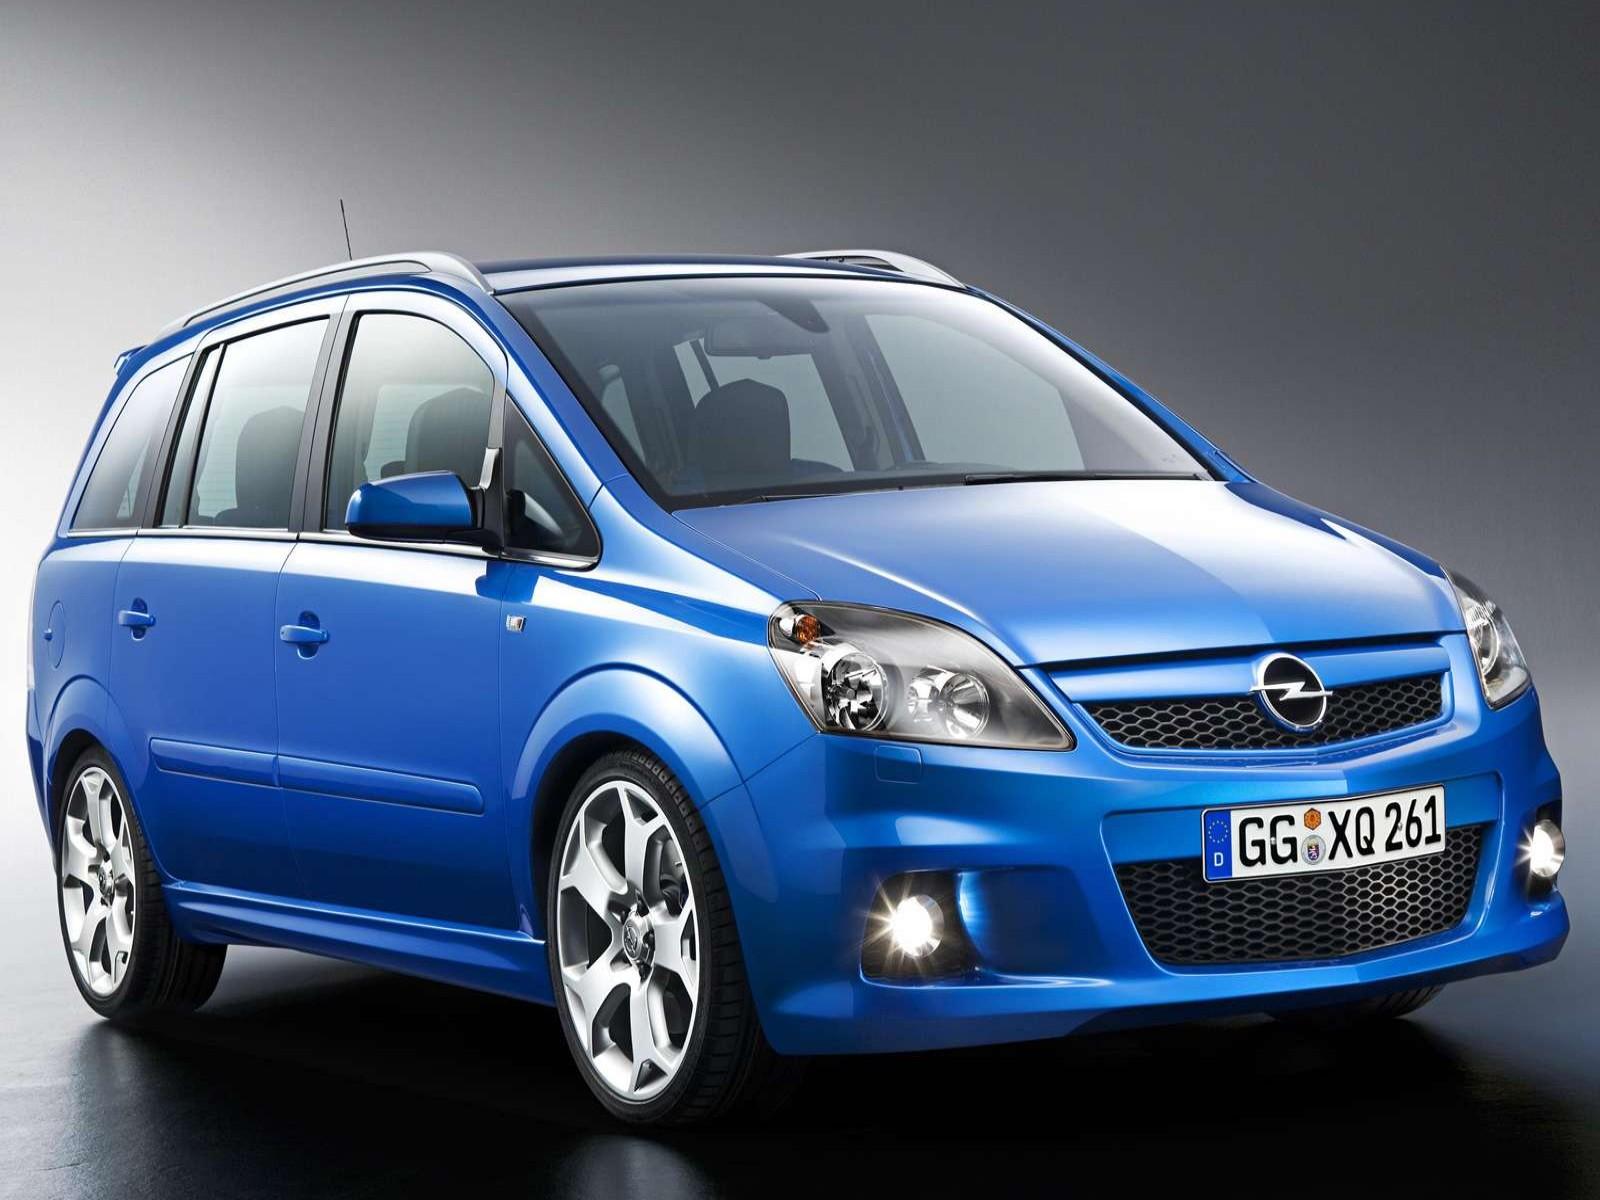 car and car zone opel zafira opc 2005 new cars car. Black Bedroom Furniture Sets. Home Design Ideas